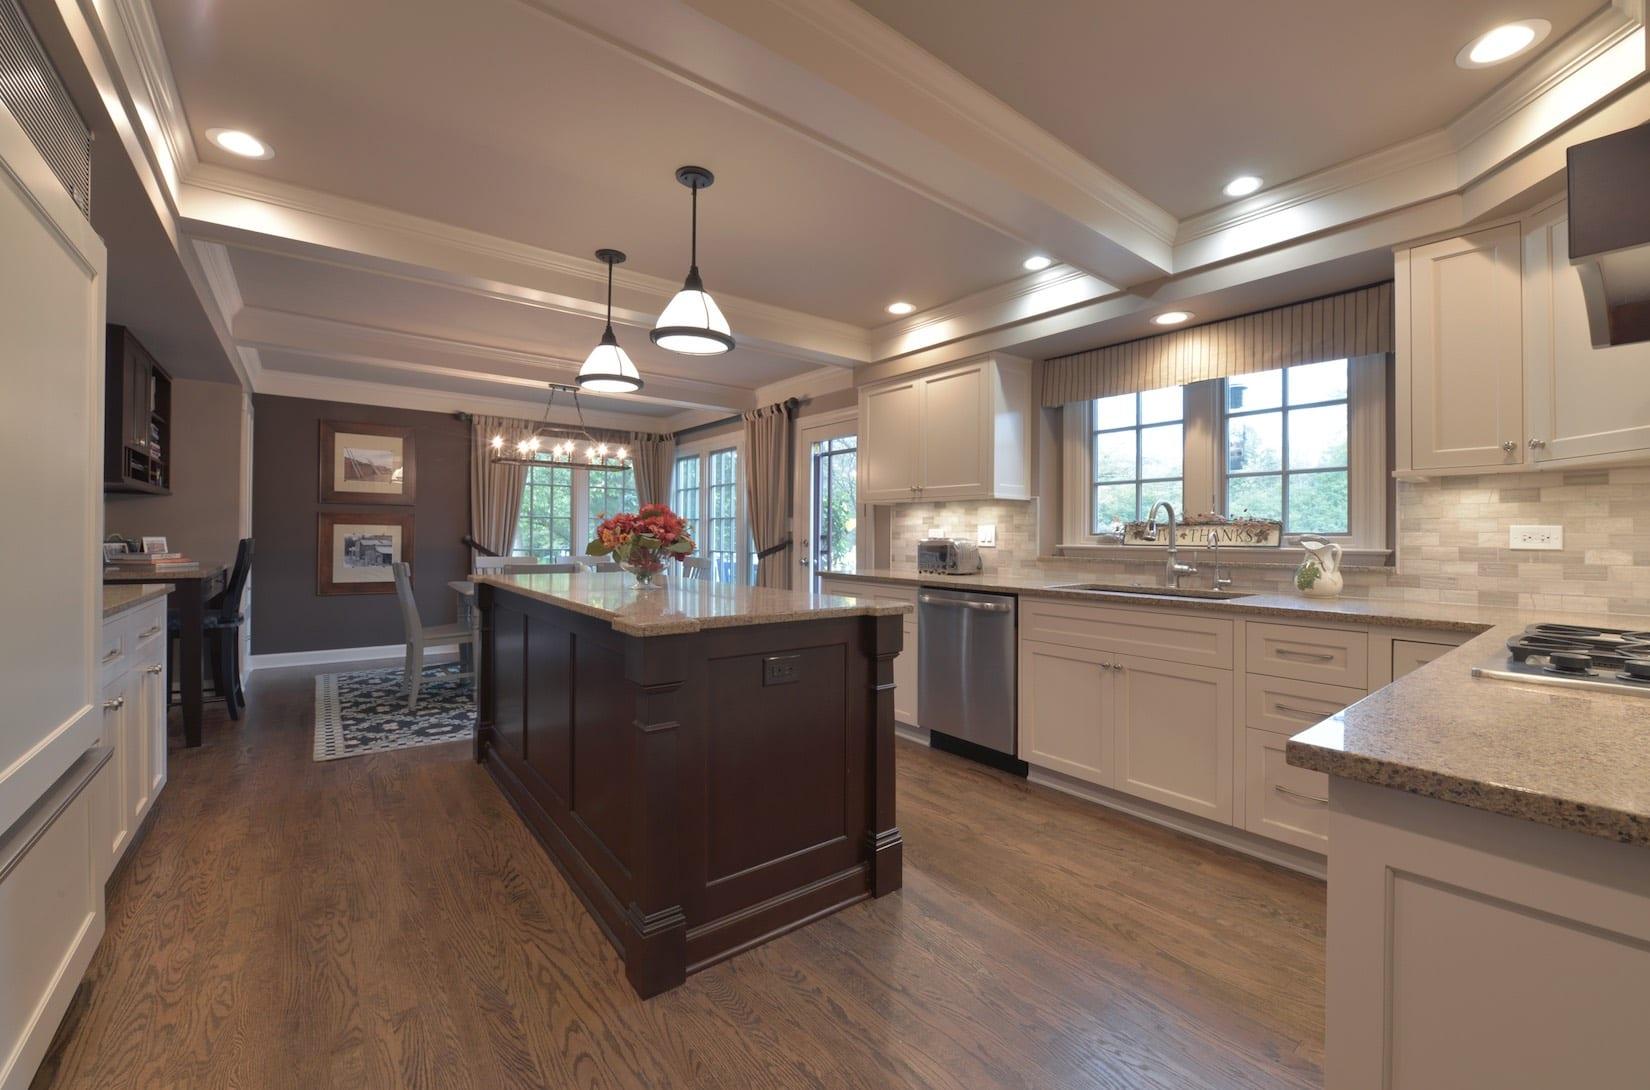 Kitchen Remodeling | Custom Kitchen Design Build | Kitchen Designer